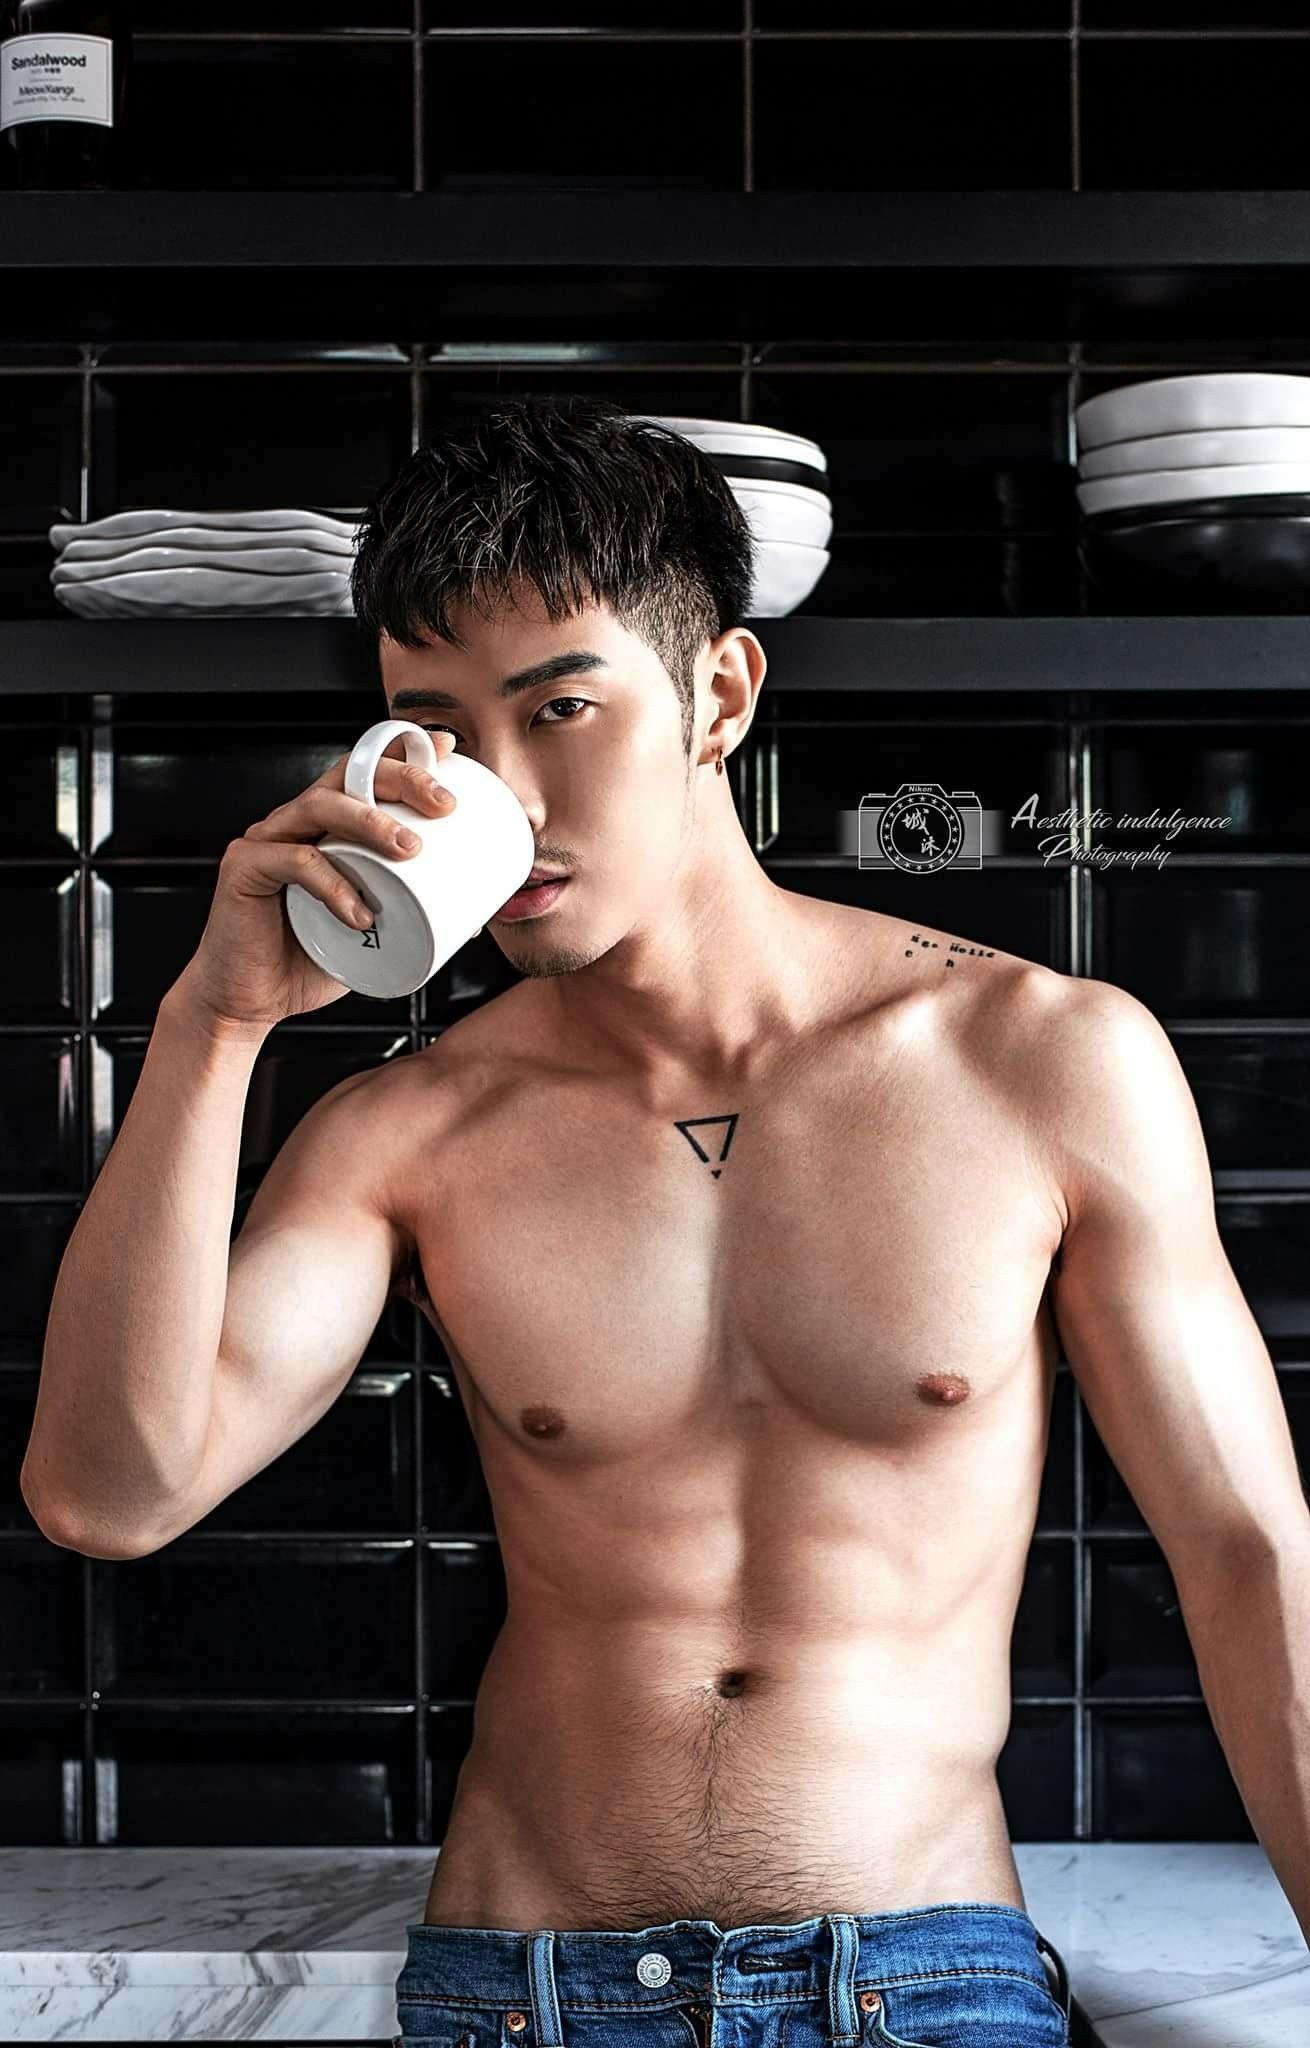 Pin by 胡勤 on 2 台 湾 猛 男 in 2019 Shirtless men, Asian men, Abs